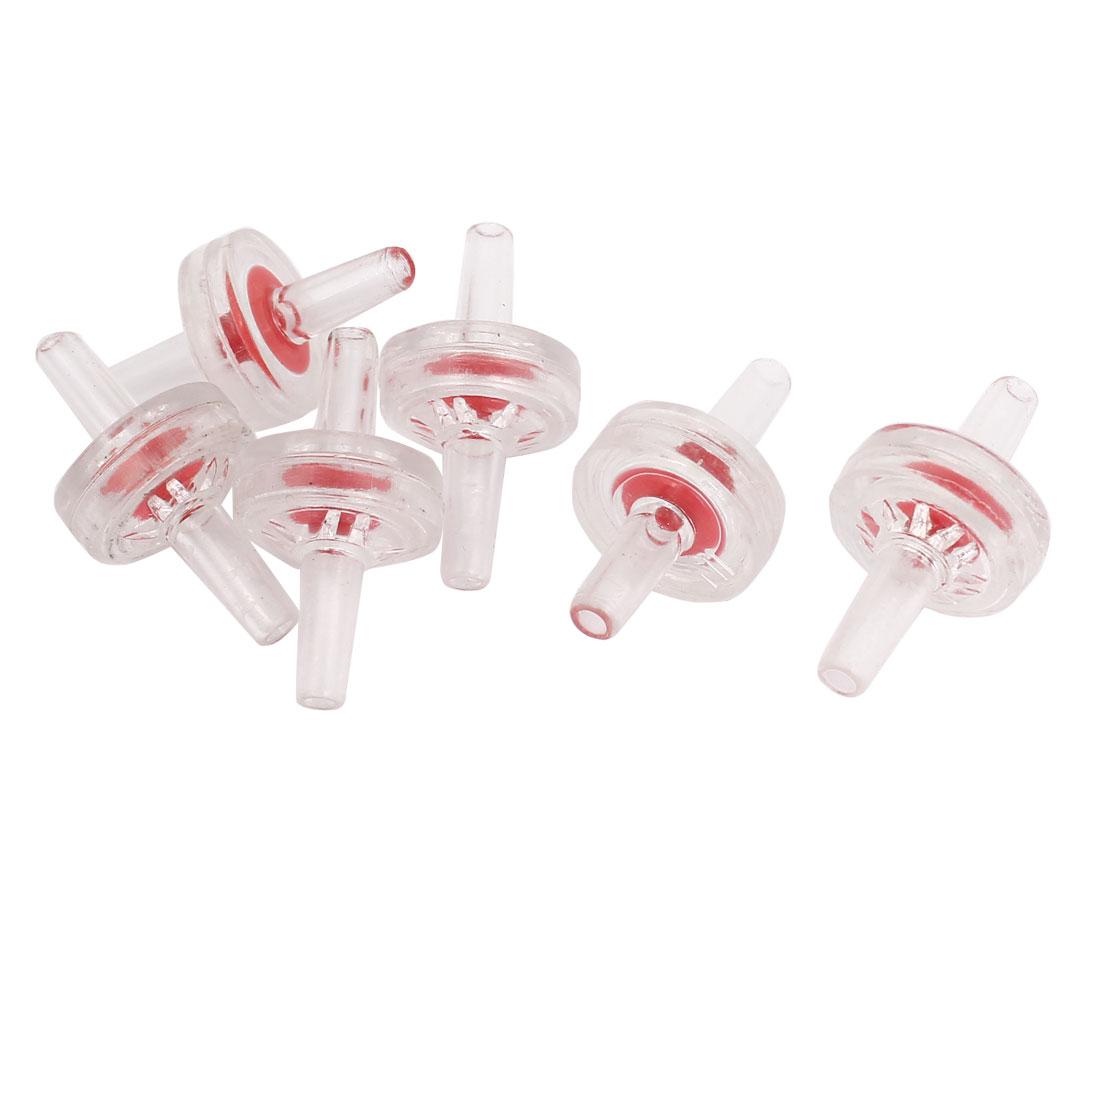 Fish Tank Air Pump Clear Red Plastic Non-return Check Valves 6 Pcs